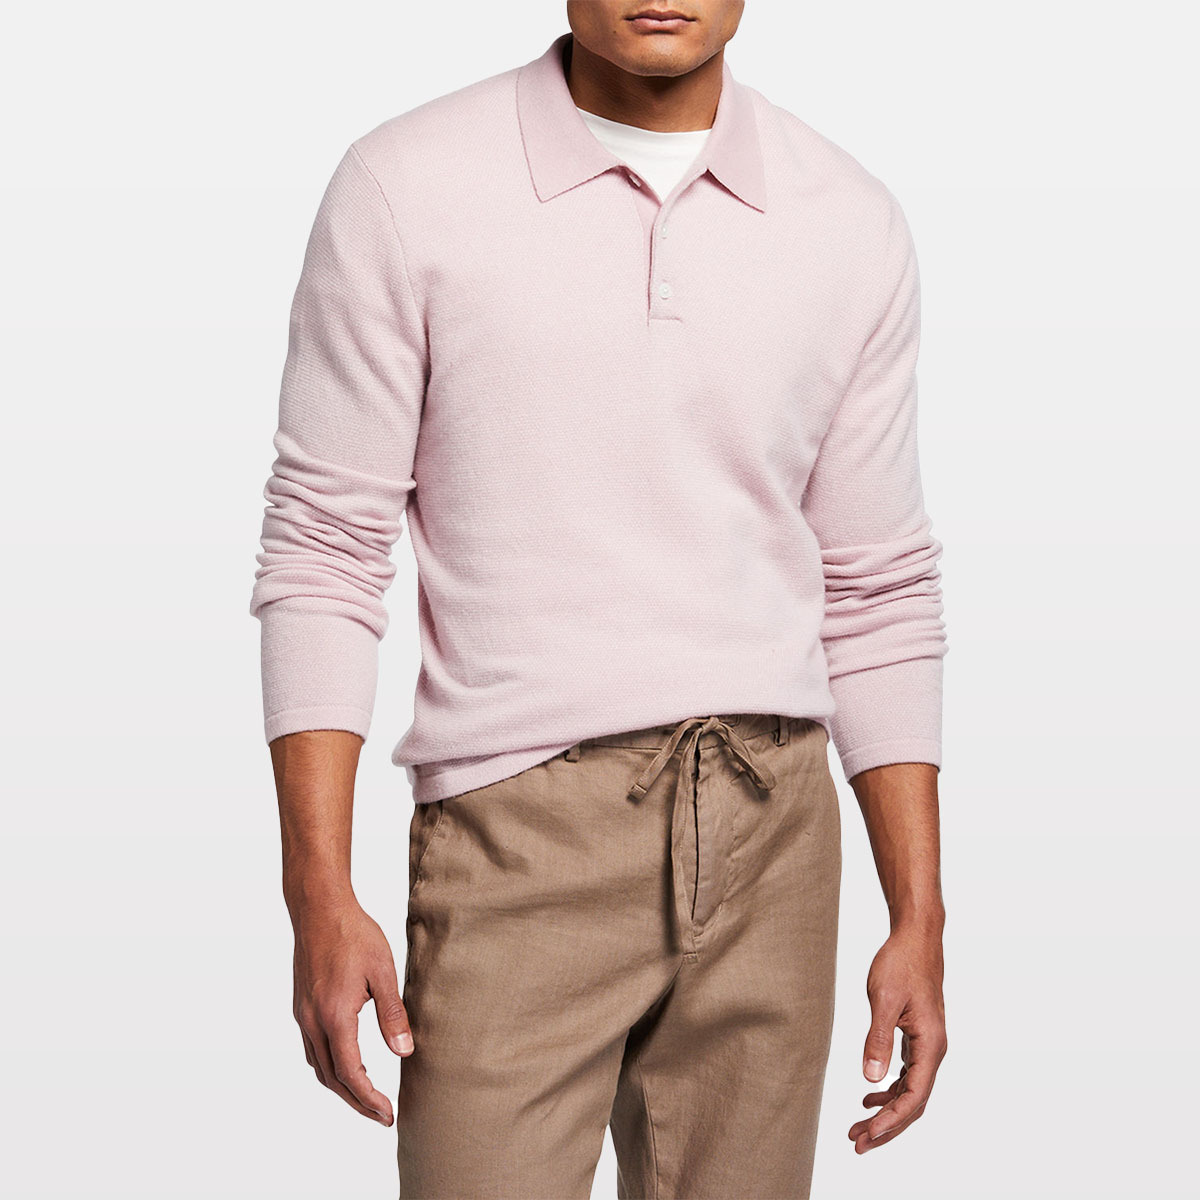 Vince Wool-Cashmere Birdseye Polo Shirt NEIMAN MARCUS